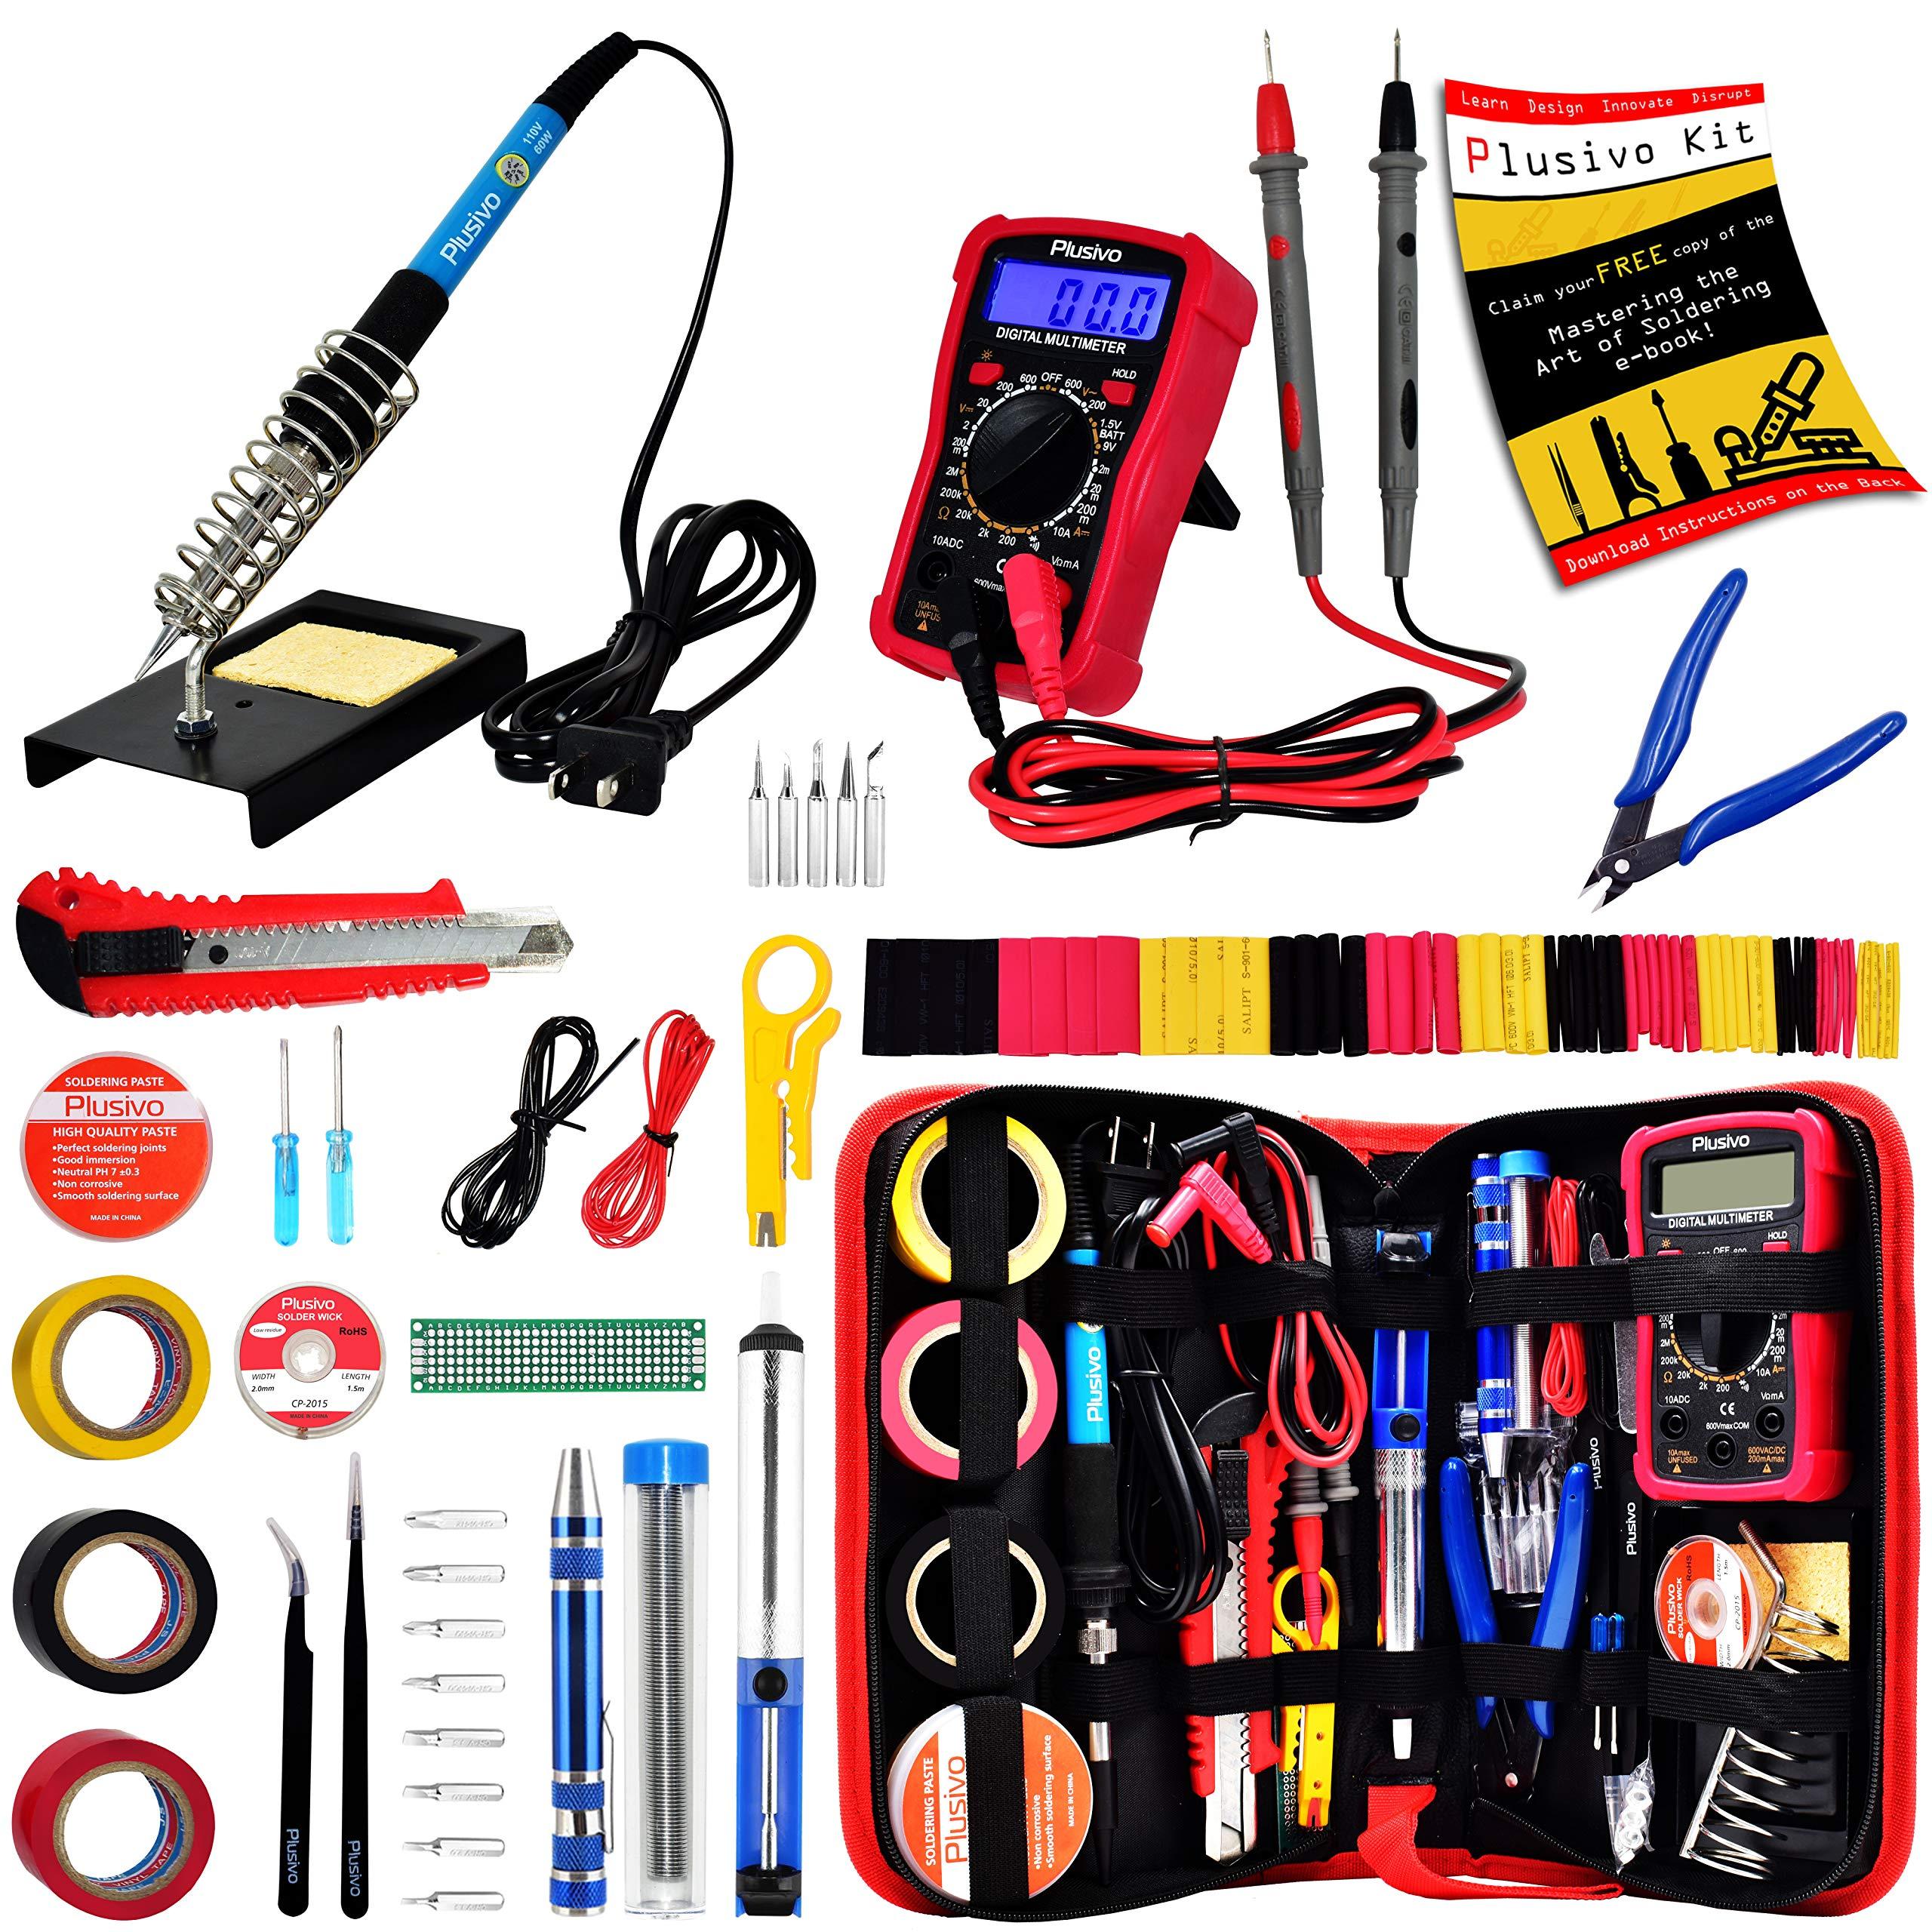 Soldering Iron Kit - Soldering Iron 60 W Adjustable Temperature, Digital Multimeter, Wire Cutter, Stand,Soldering Iron Tip Set, Desoldering Pump, Solder Wick, Tweezers, Rosin, Wire - [110 V, US Plug]